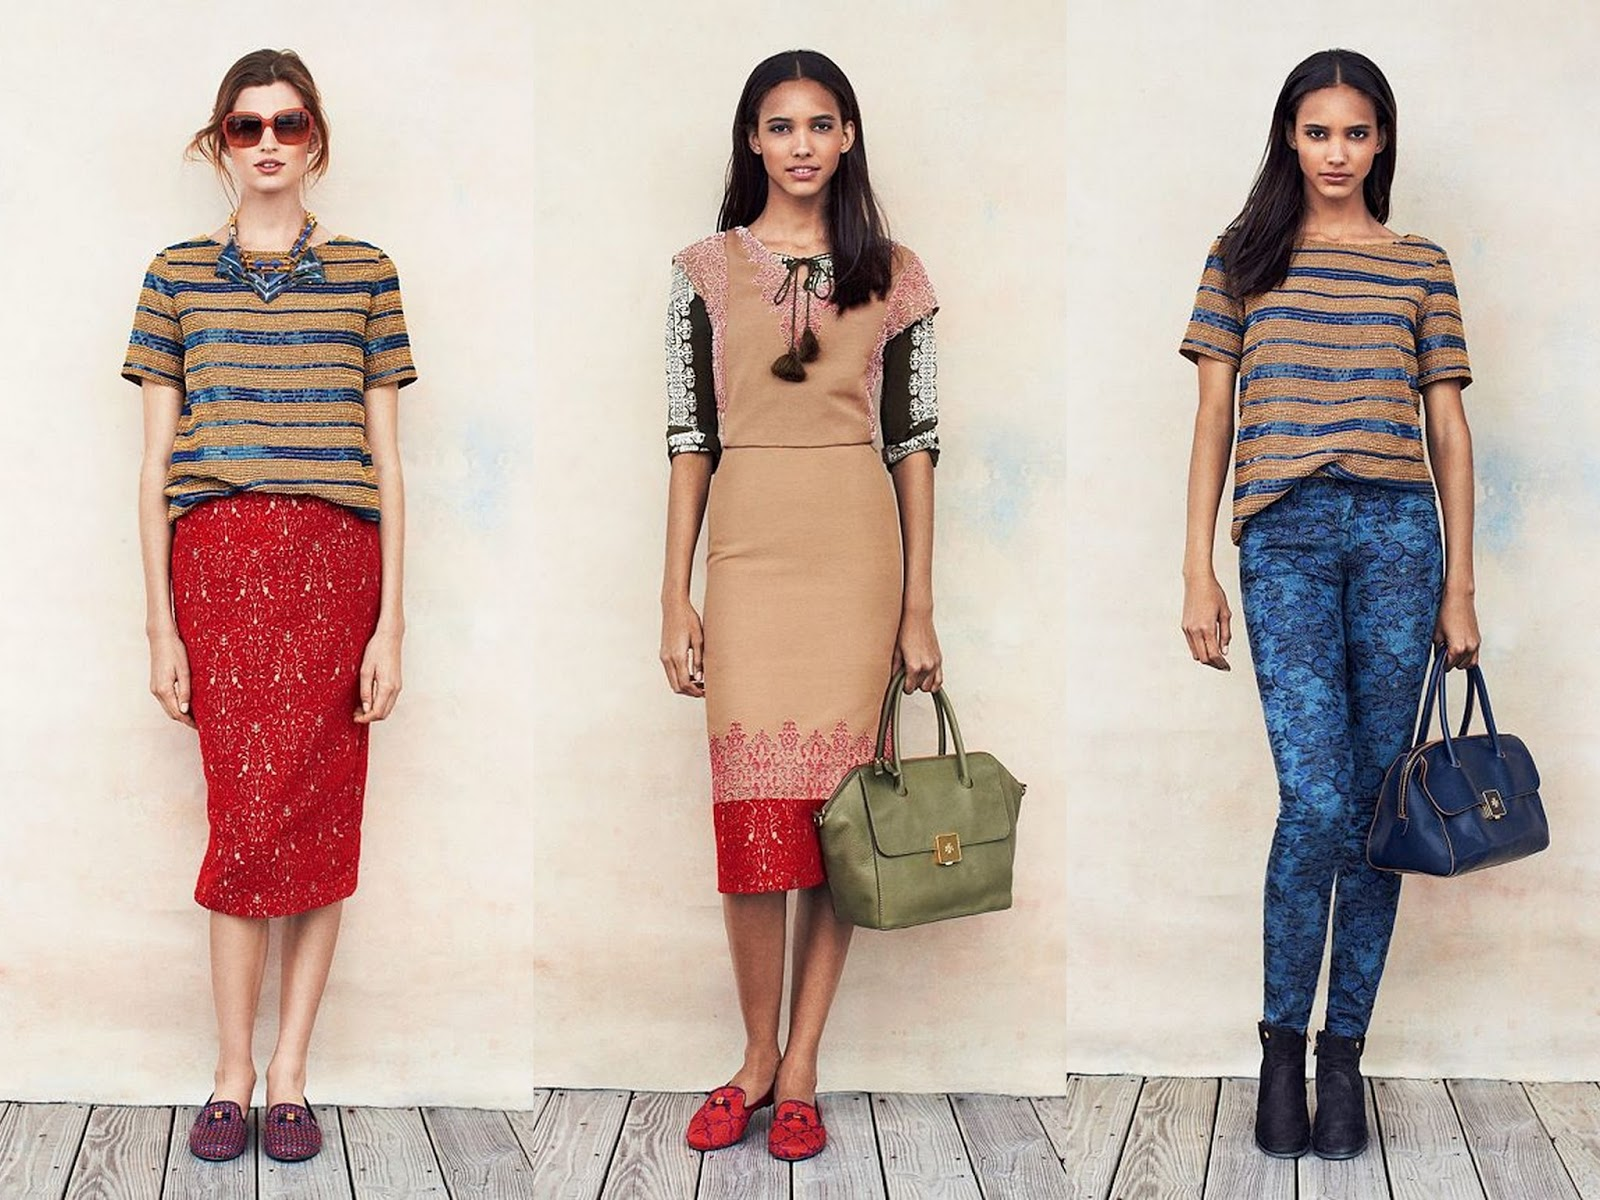 eaccf5c883fe Tory Burch Pre-Fall Lookbook  Shop The Look - Look Linger Love Look ...